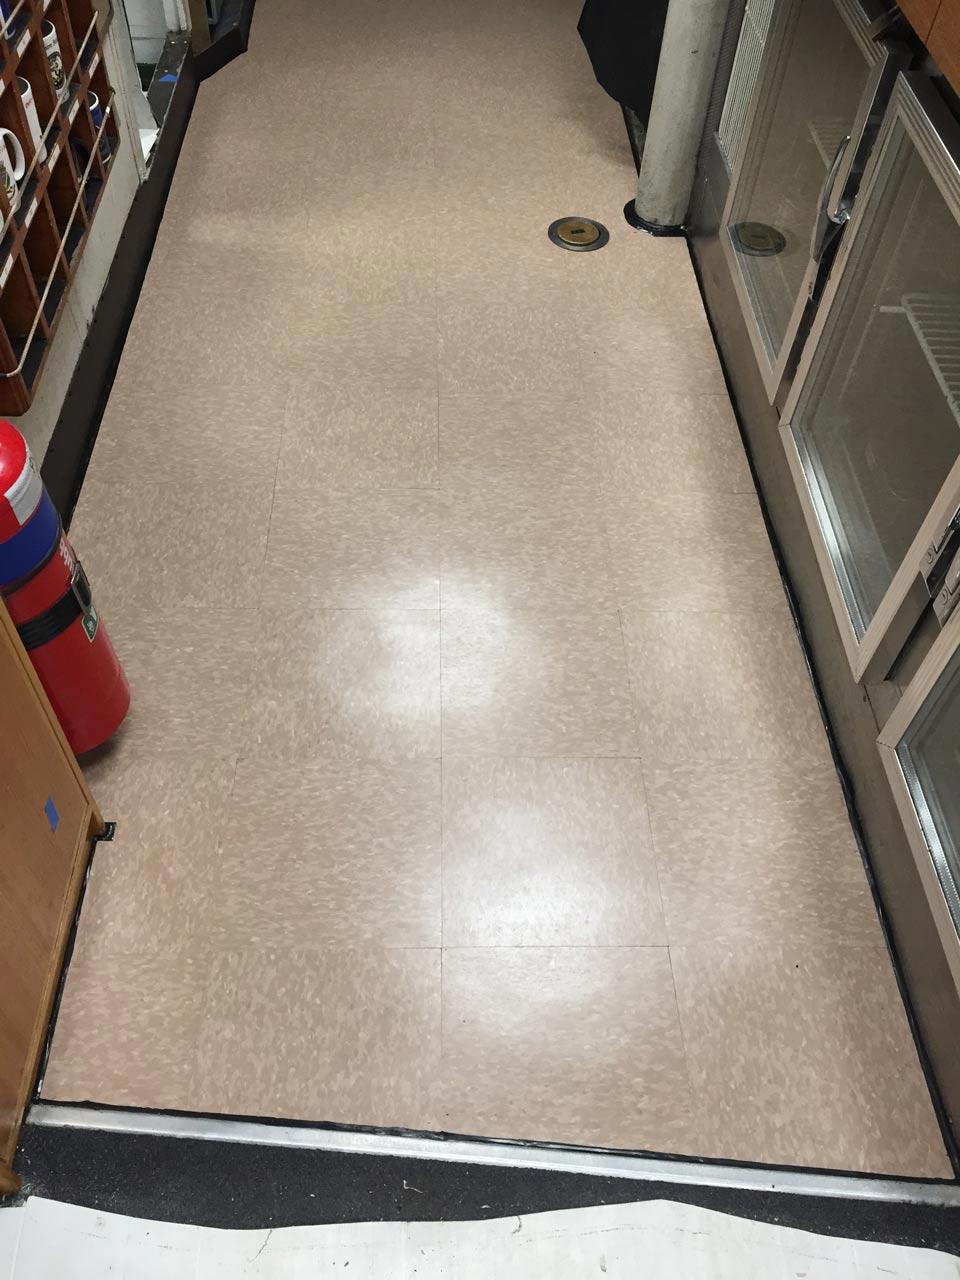 Non slip rubber tiles matting vinyl tiles favcote tile photo m2701 after 7 dailygadgetfo Gallery